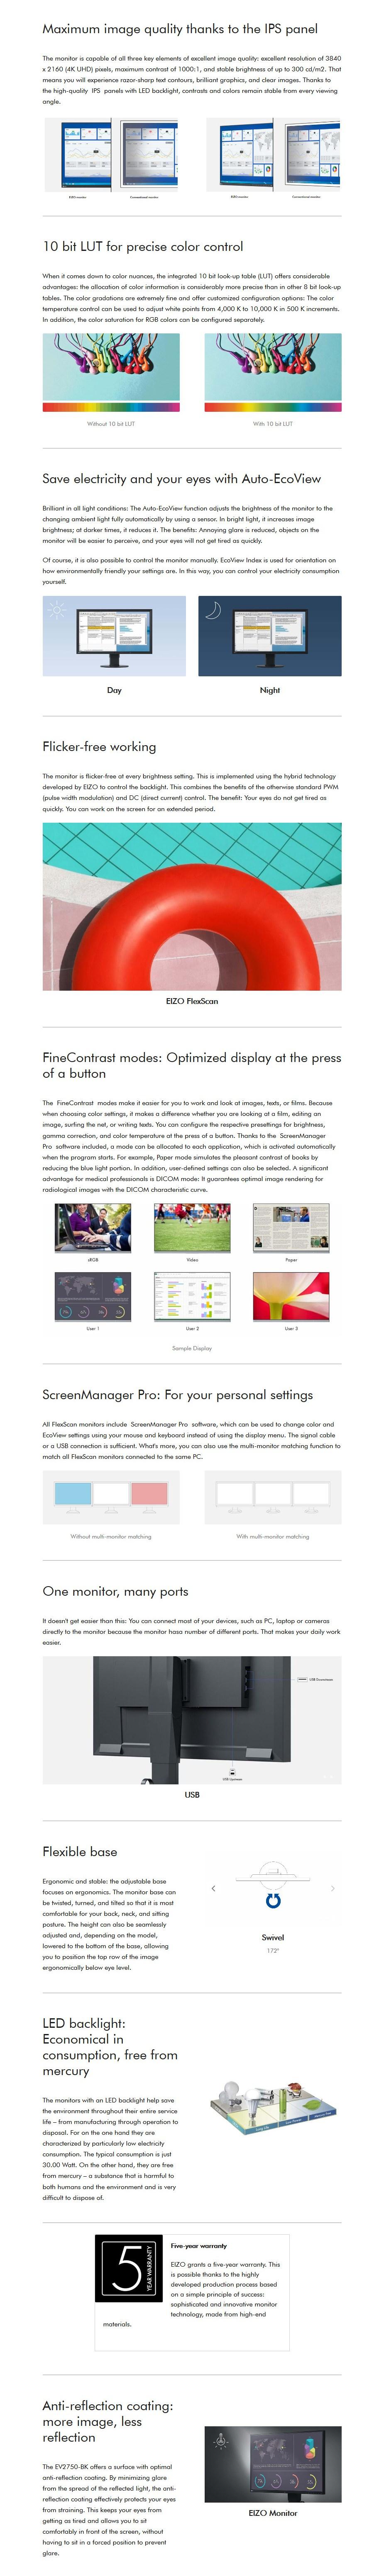 "Eizo FlexScan S1934 19"" SXGA IPS LED Monitor - Desktop Overview 1"